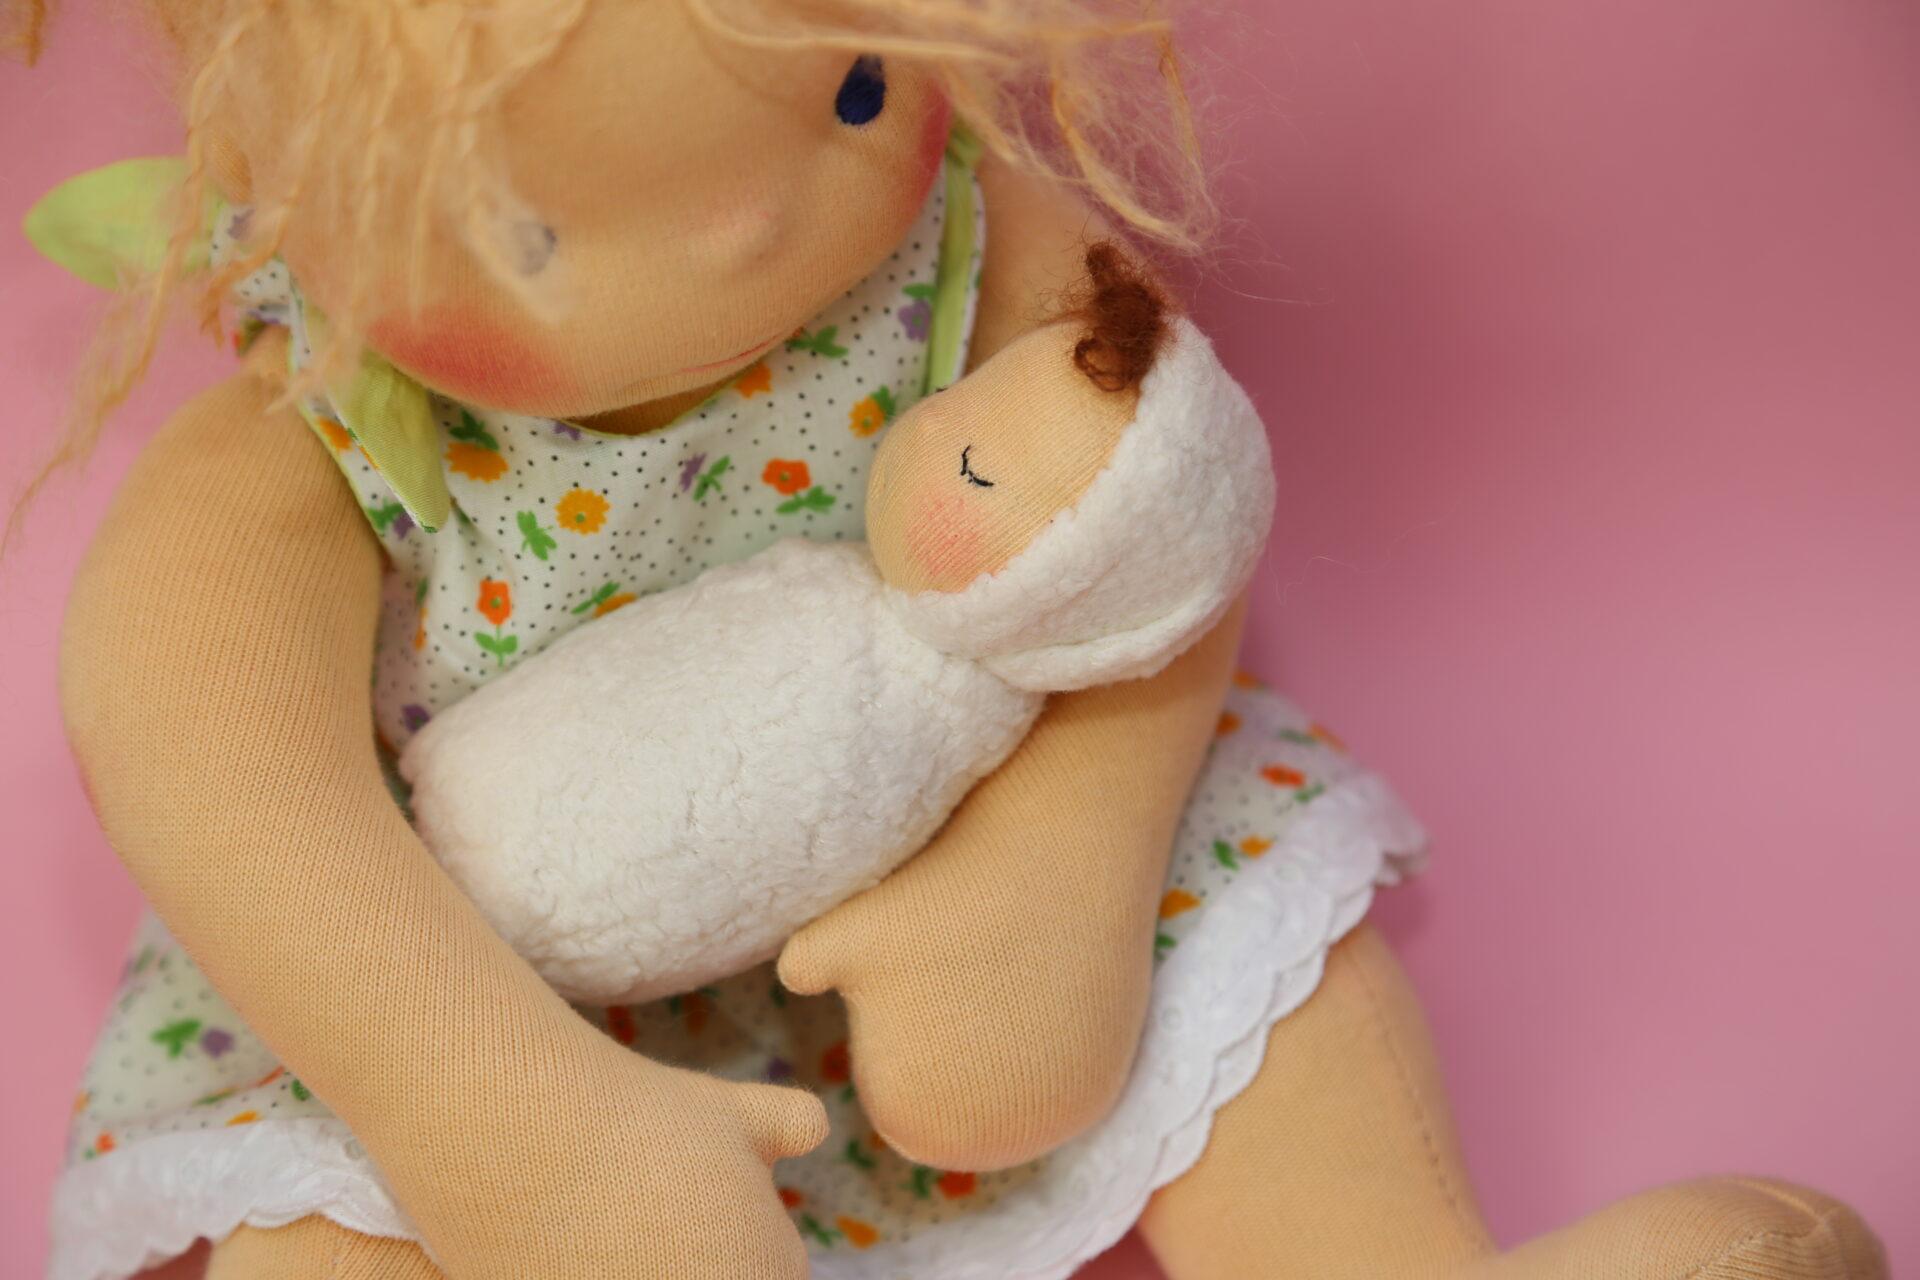 waldorfská panenka s malou panenkou v náručí, panenky s duší, ekopanenky